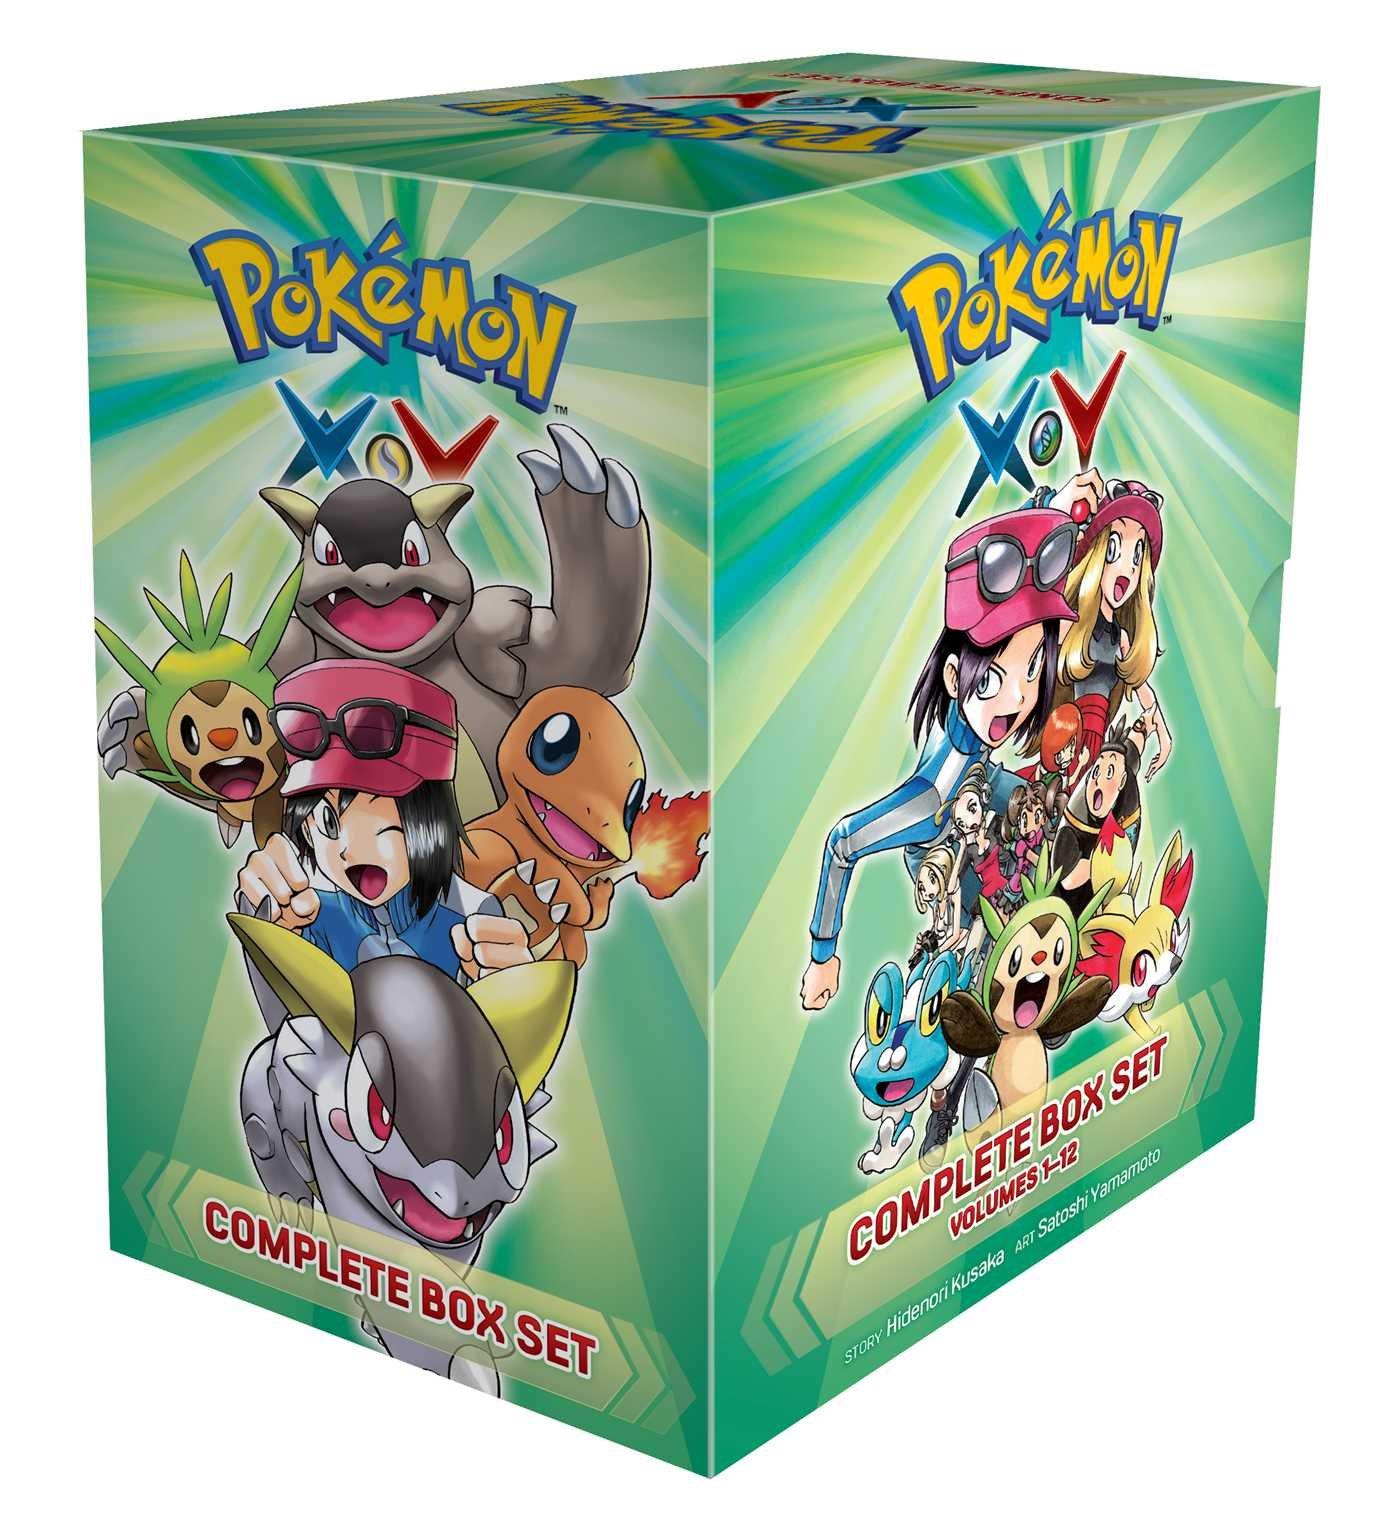 Pokémon XY Complete Box Set: Includes vols. 1-12 (Pokemon)